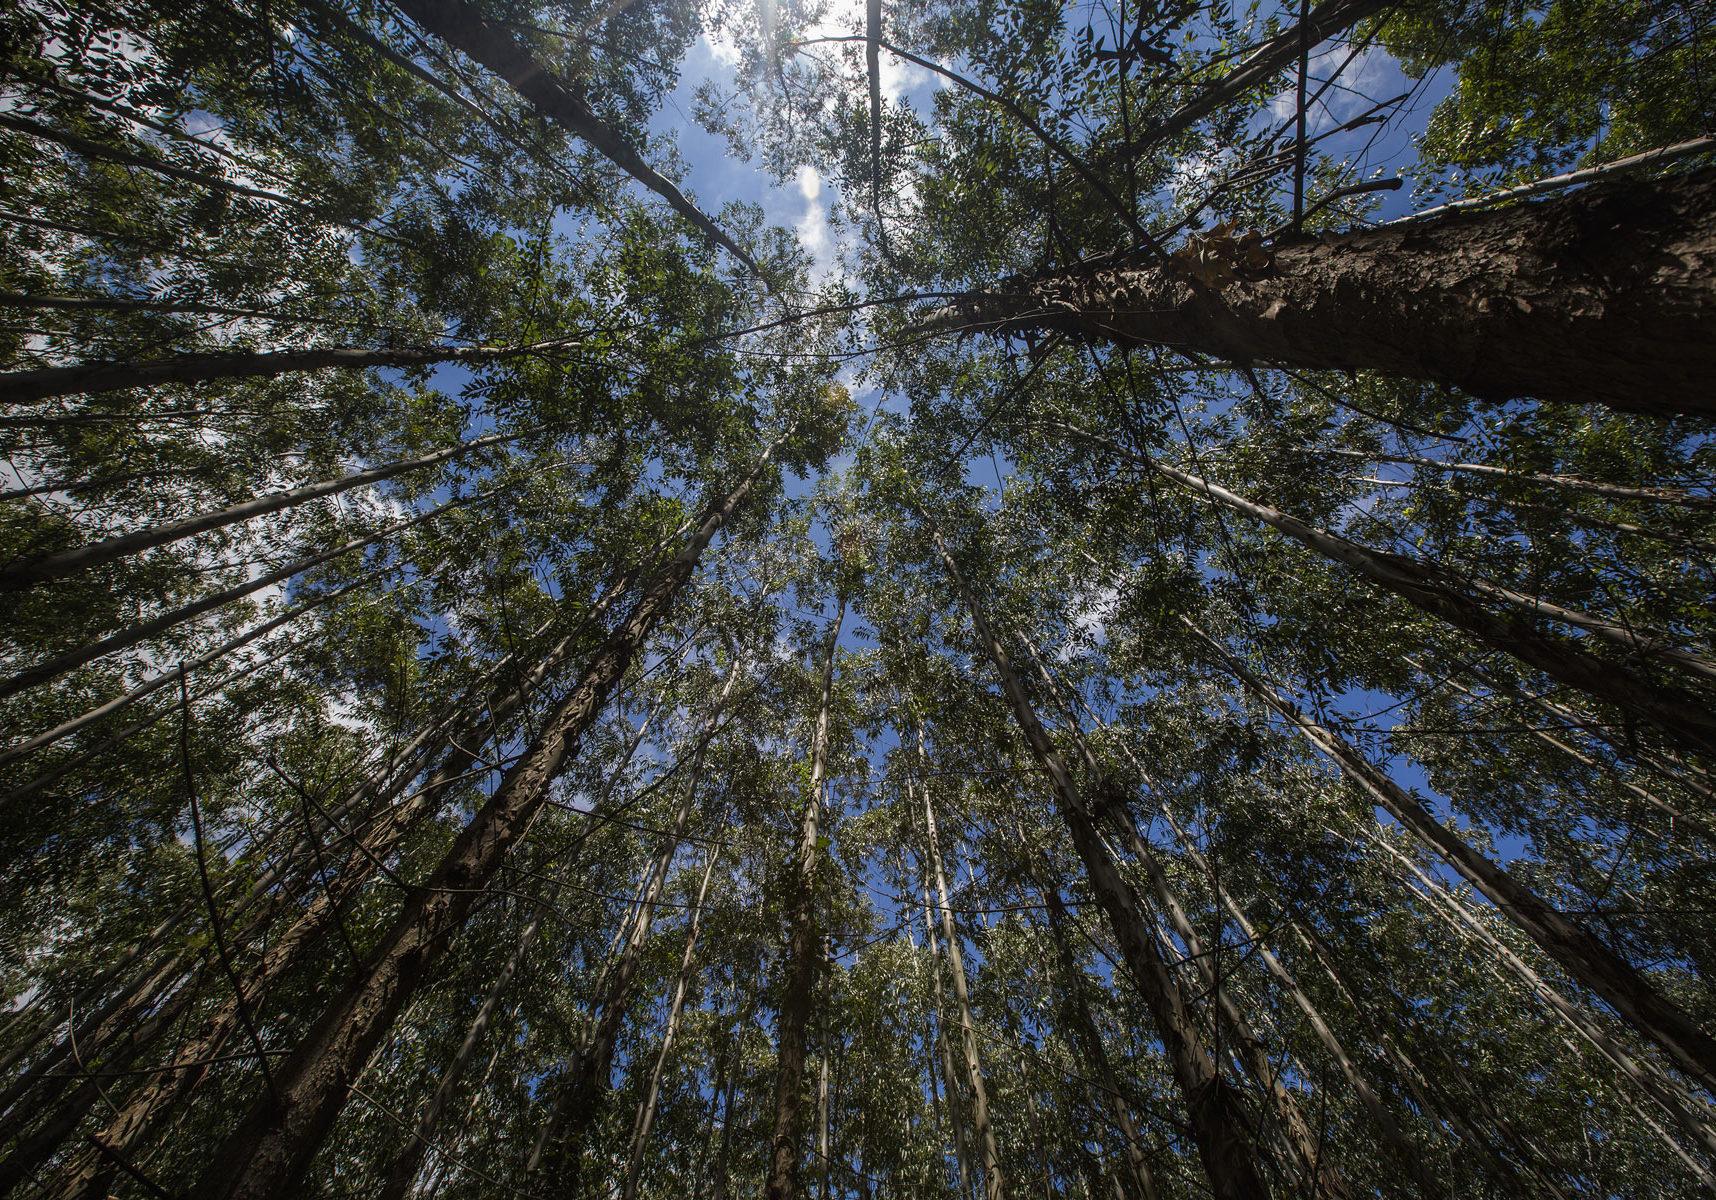 bigstock-Eucalyptus-Forest-In-Sao-Paulo-217052998